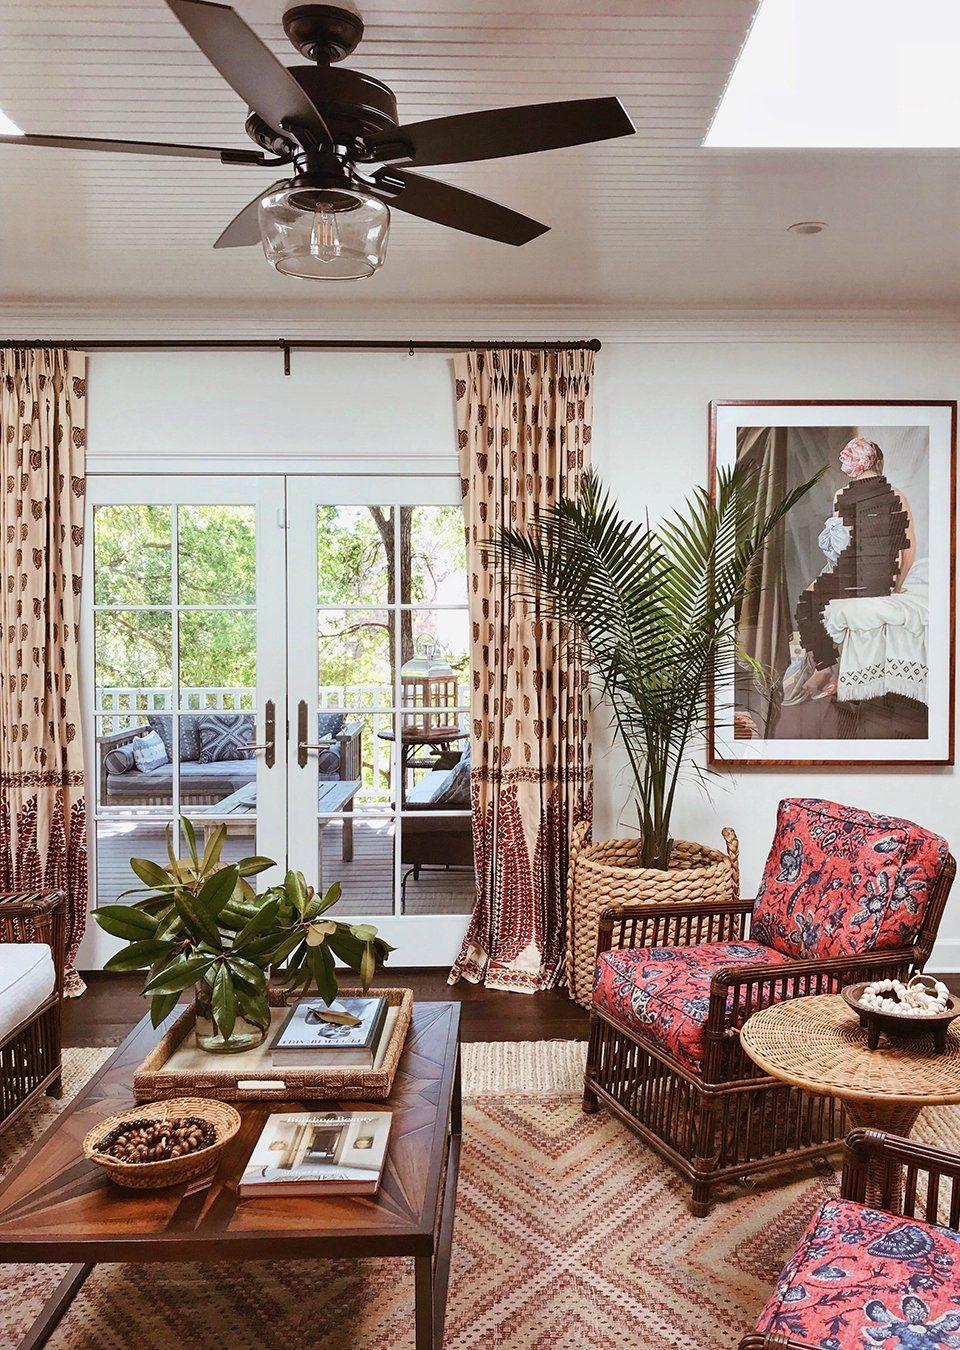 Austin's Southern Living Idea House